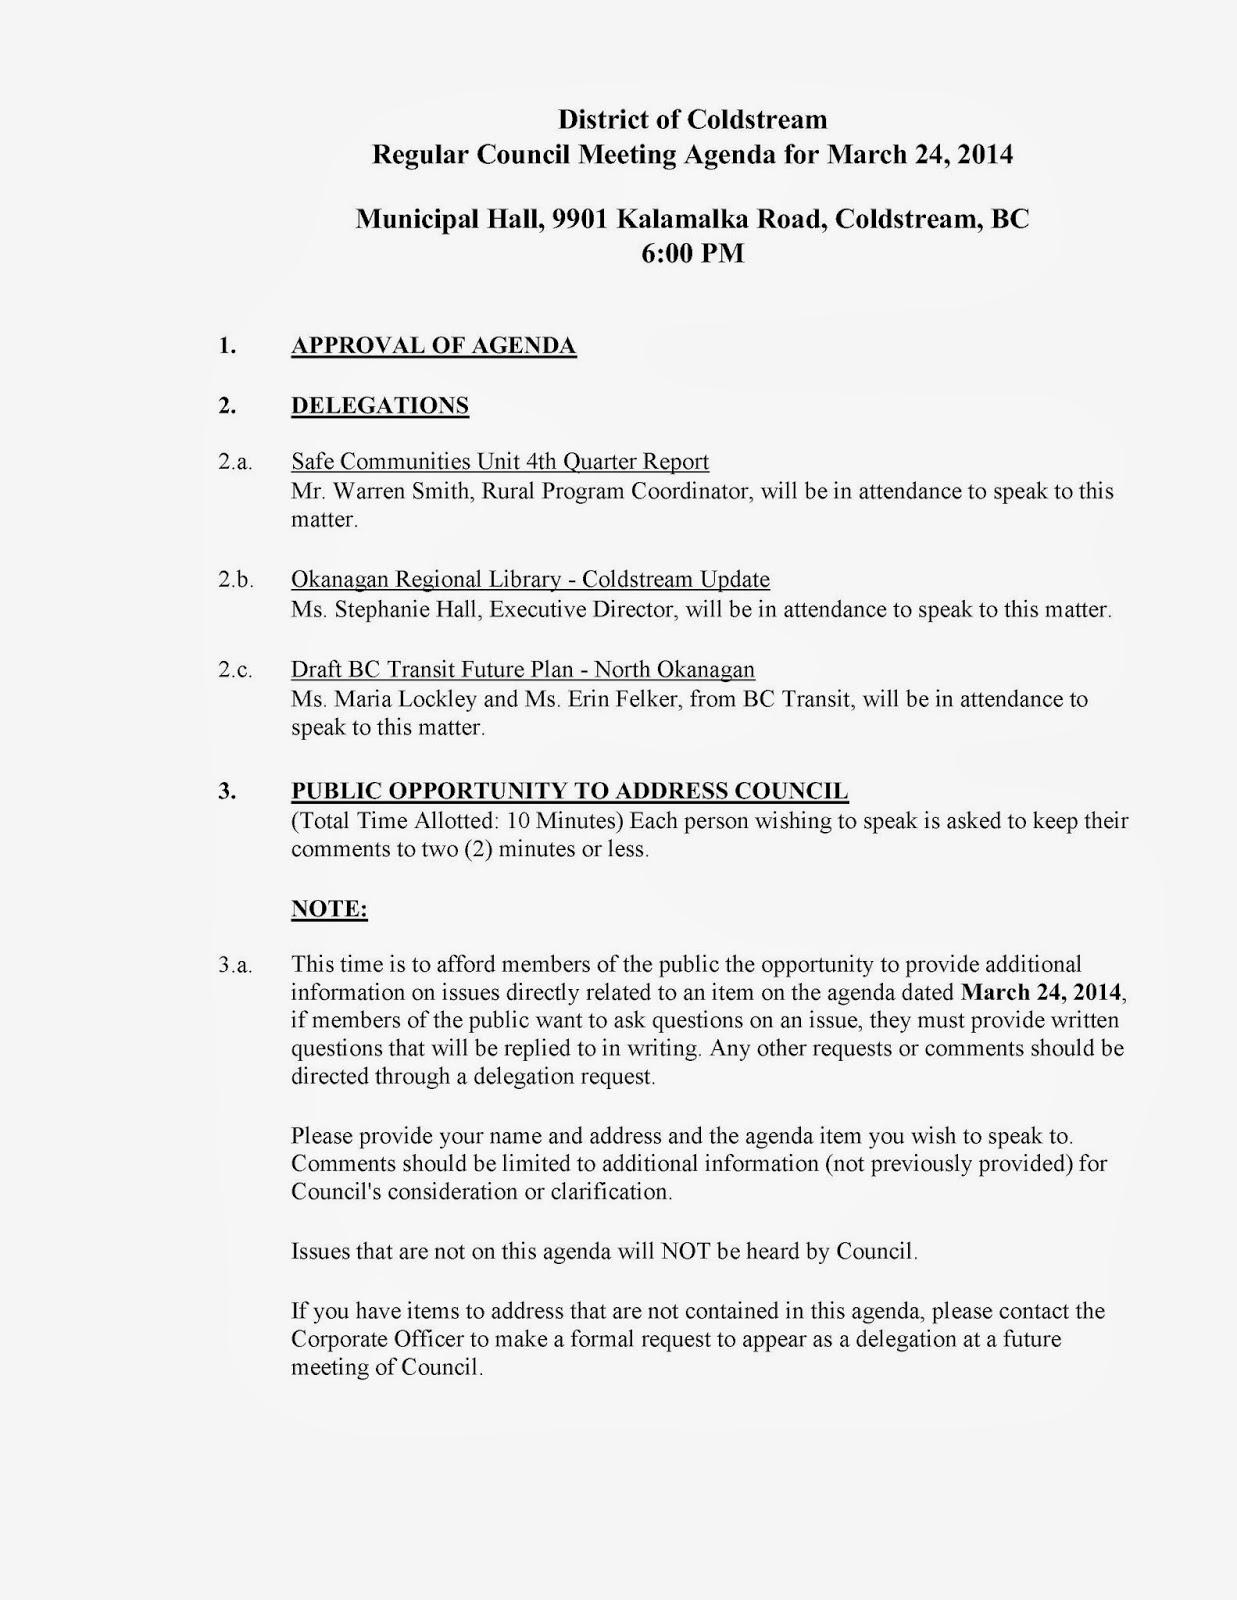 http://coldstream.civicweb.net/Documents/DocumentList.aspx?ID=13850